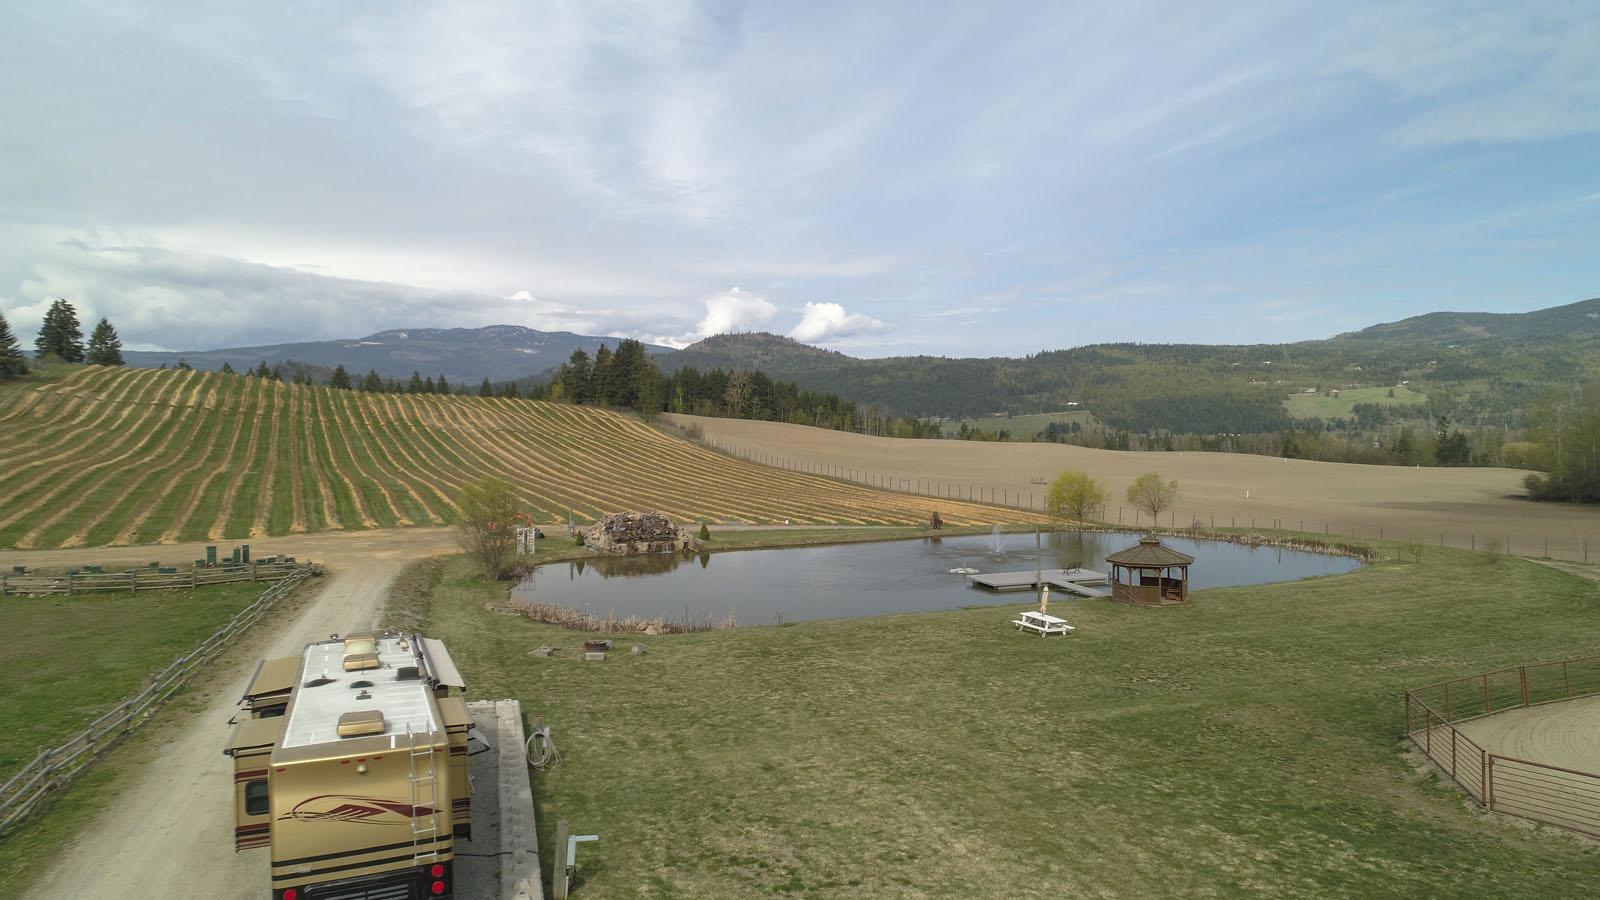 Baccata ridge winery 03